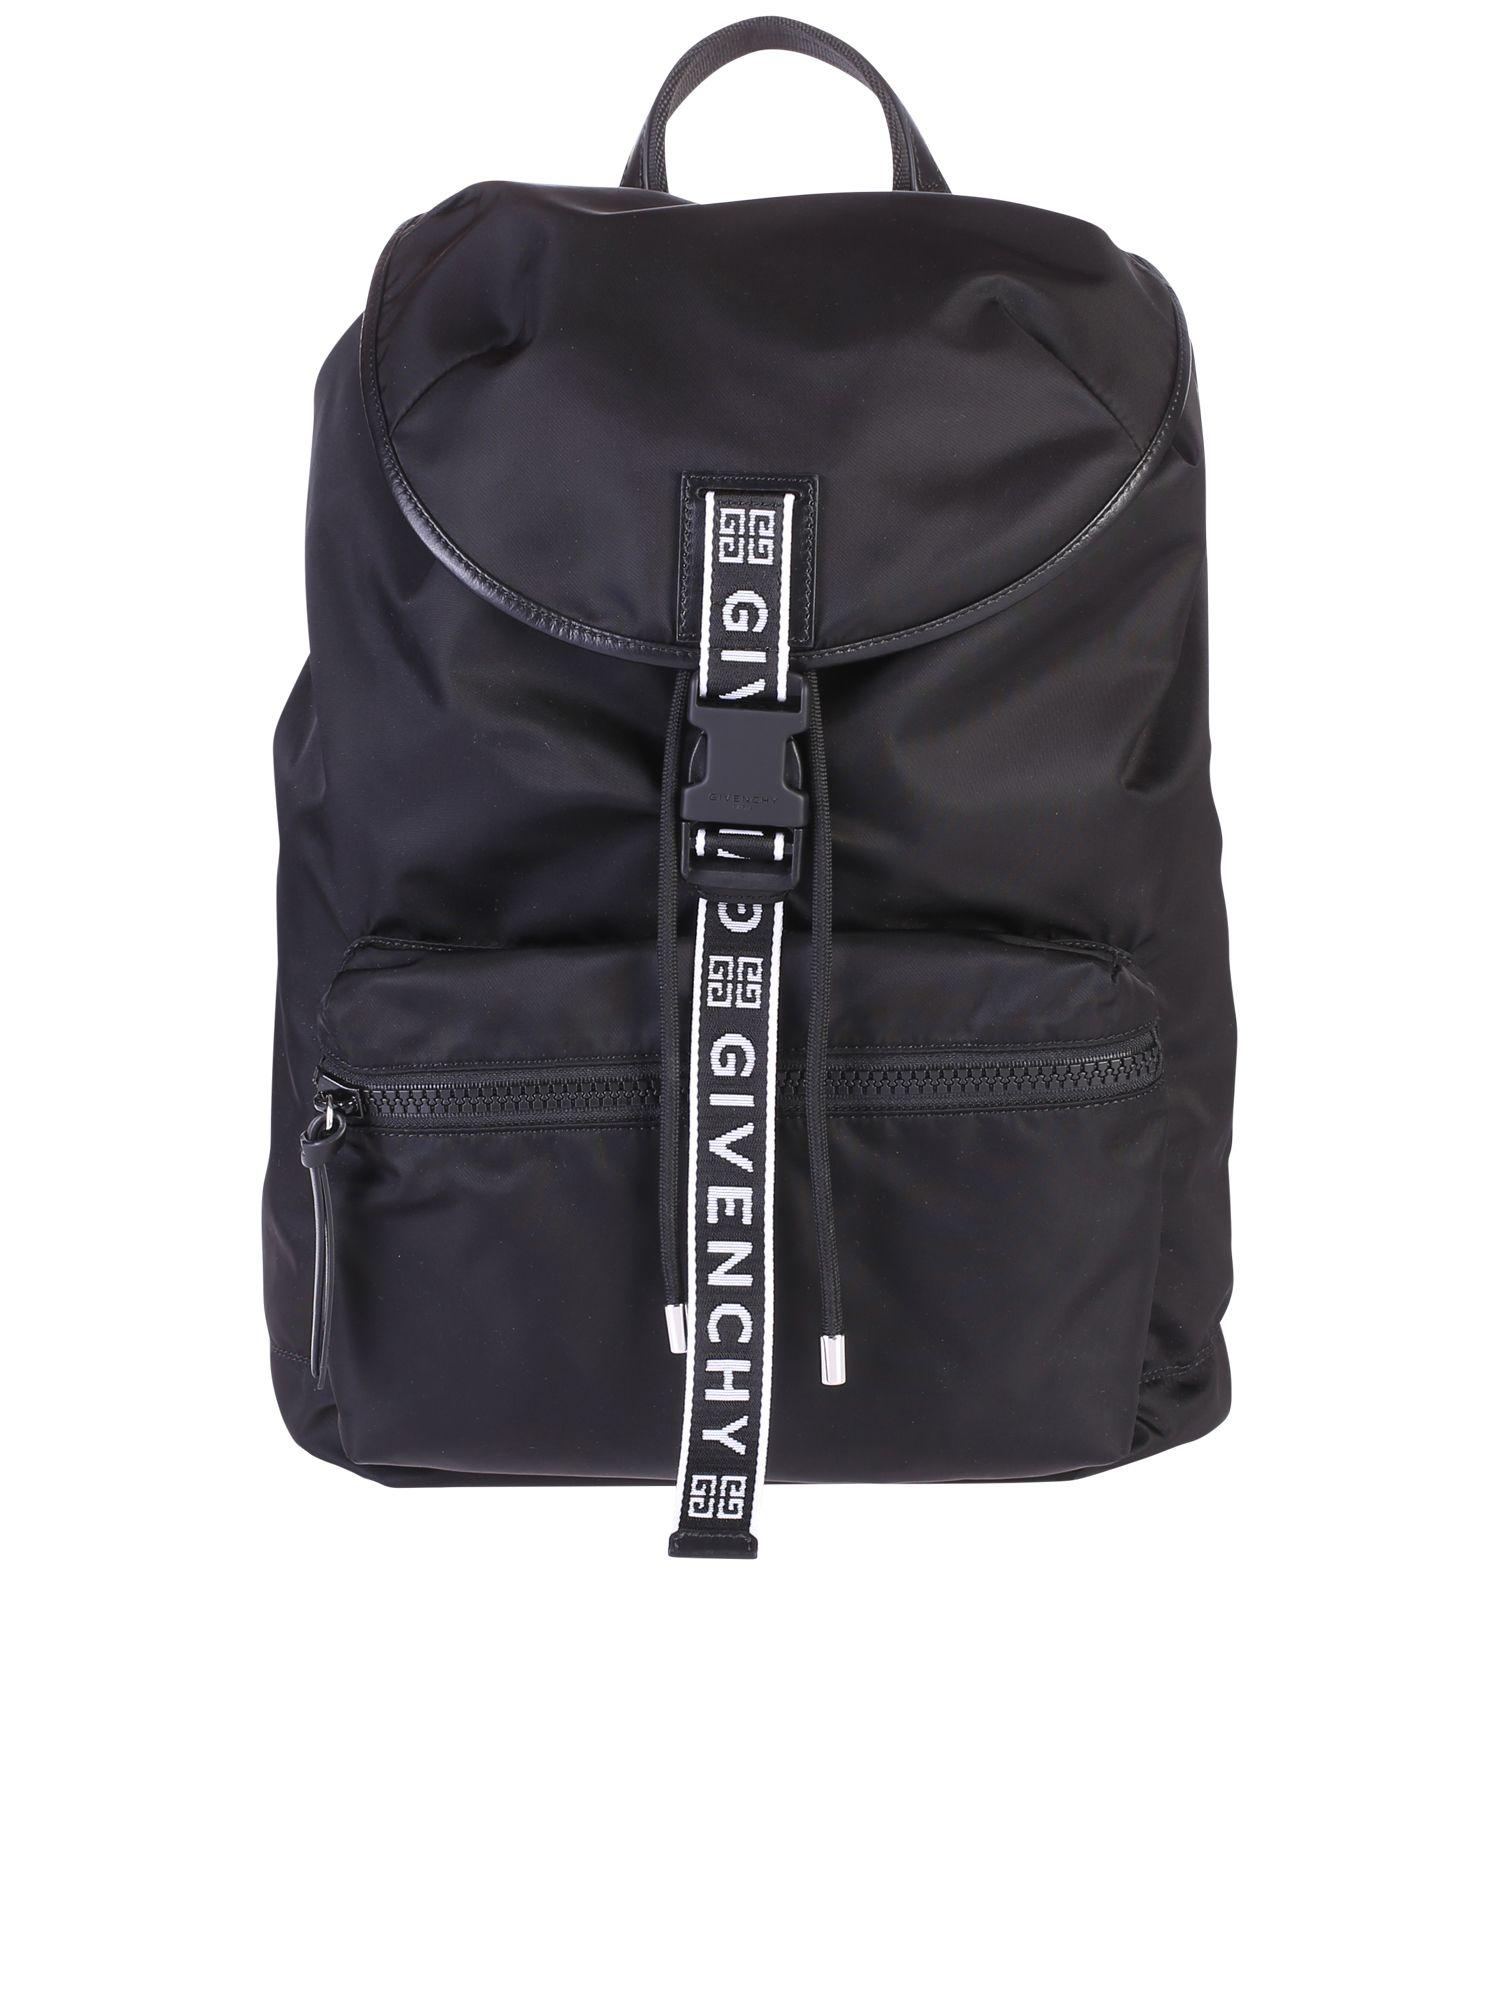 GIVENCHY BLACK BRANDED BACKPACK  ecb110d715cba